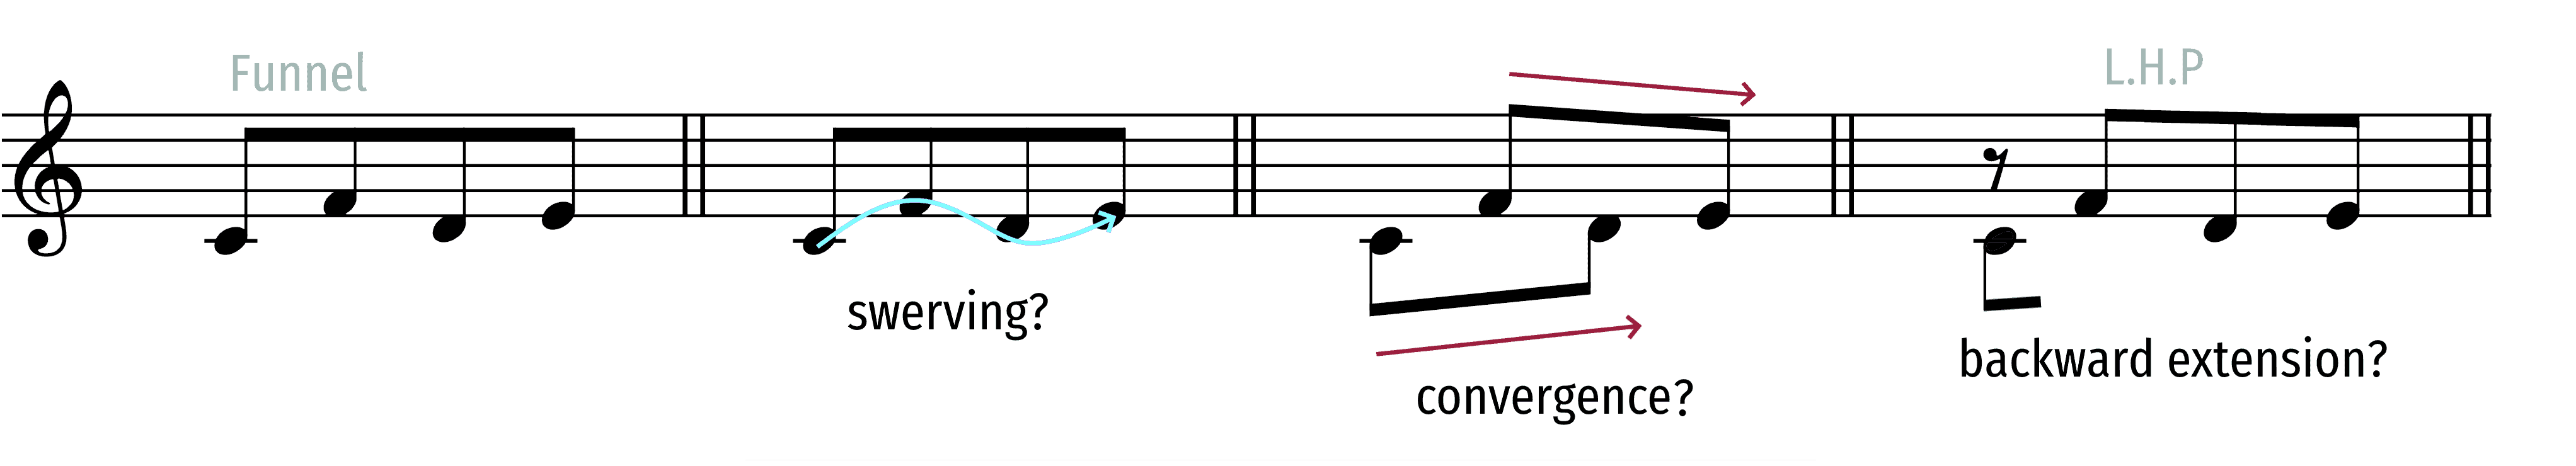 funnel-direction-illustration